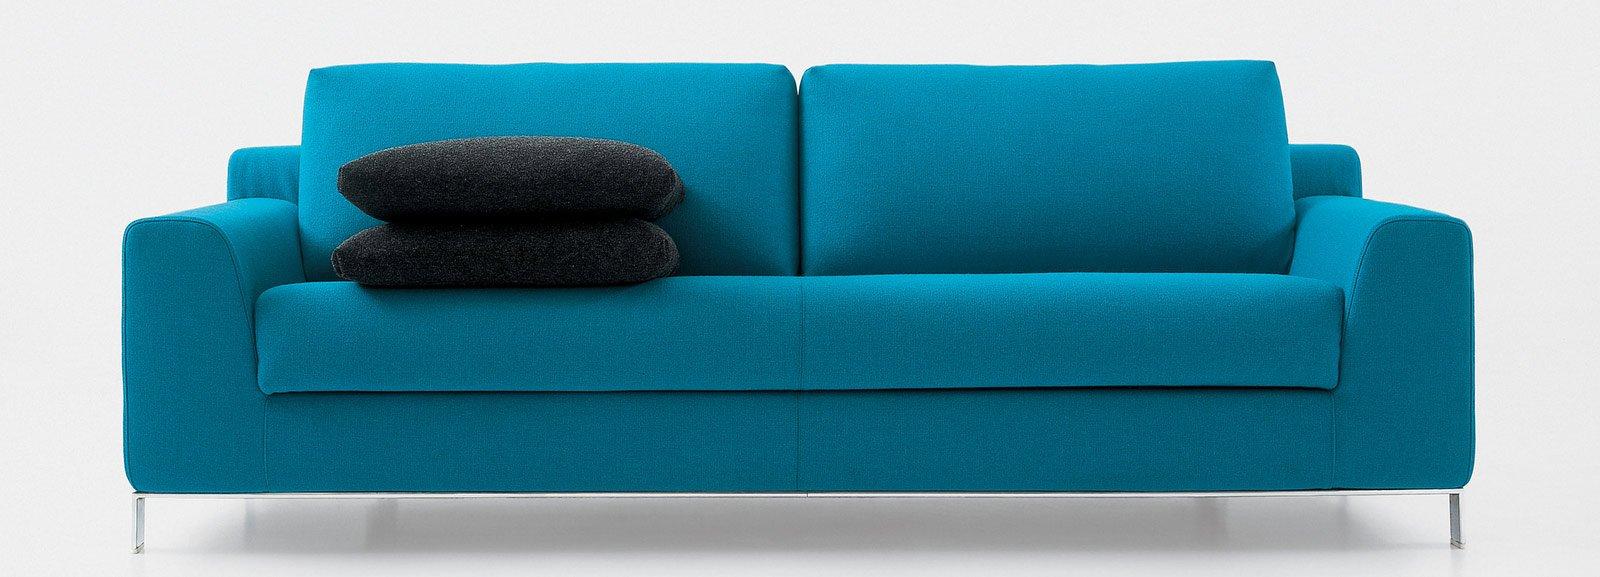 Divani blu cose di casa - Divano letto blu ...